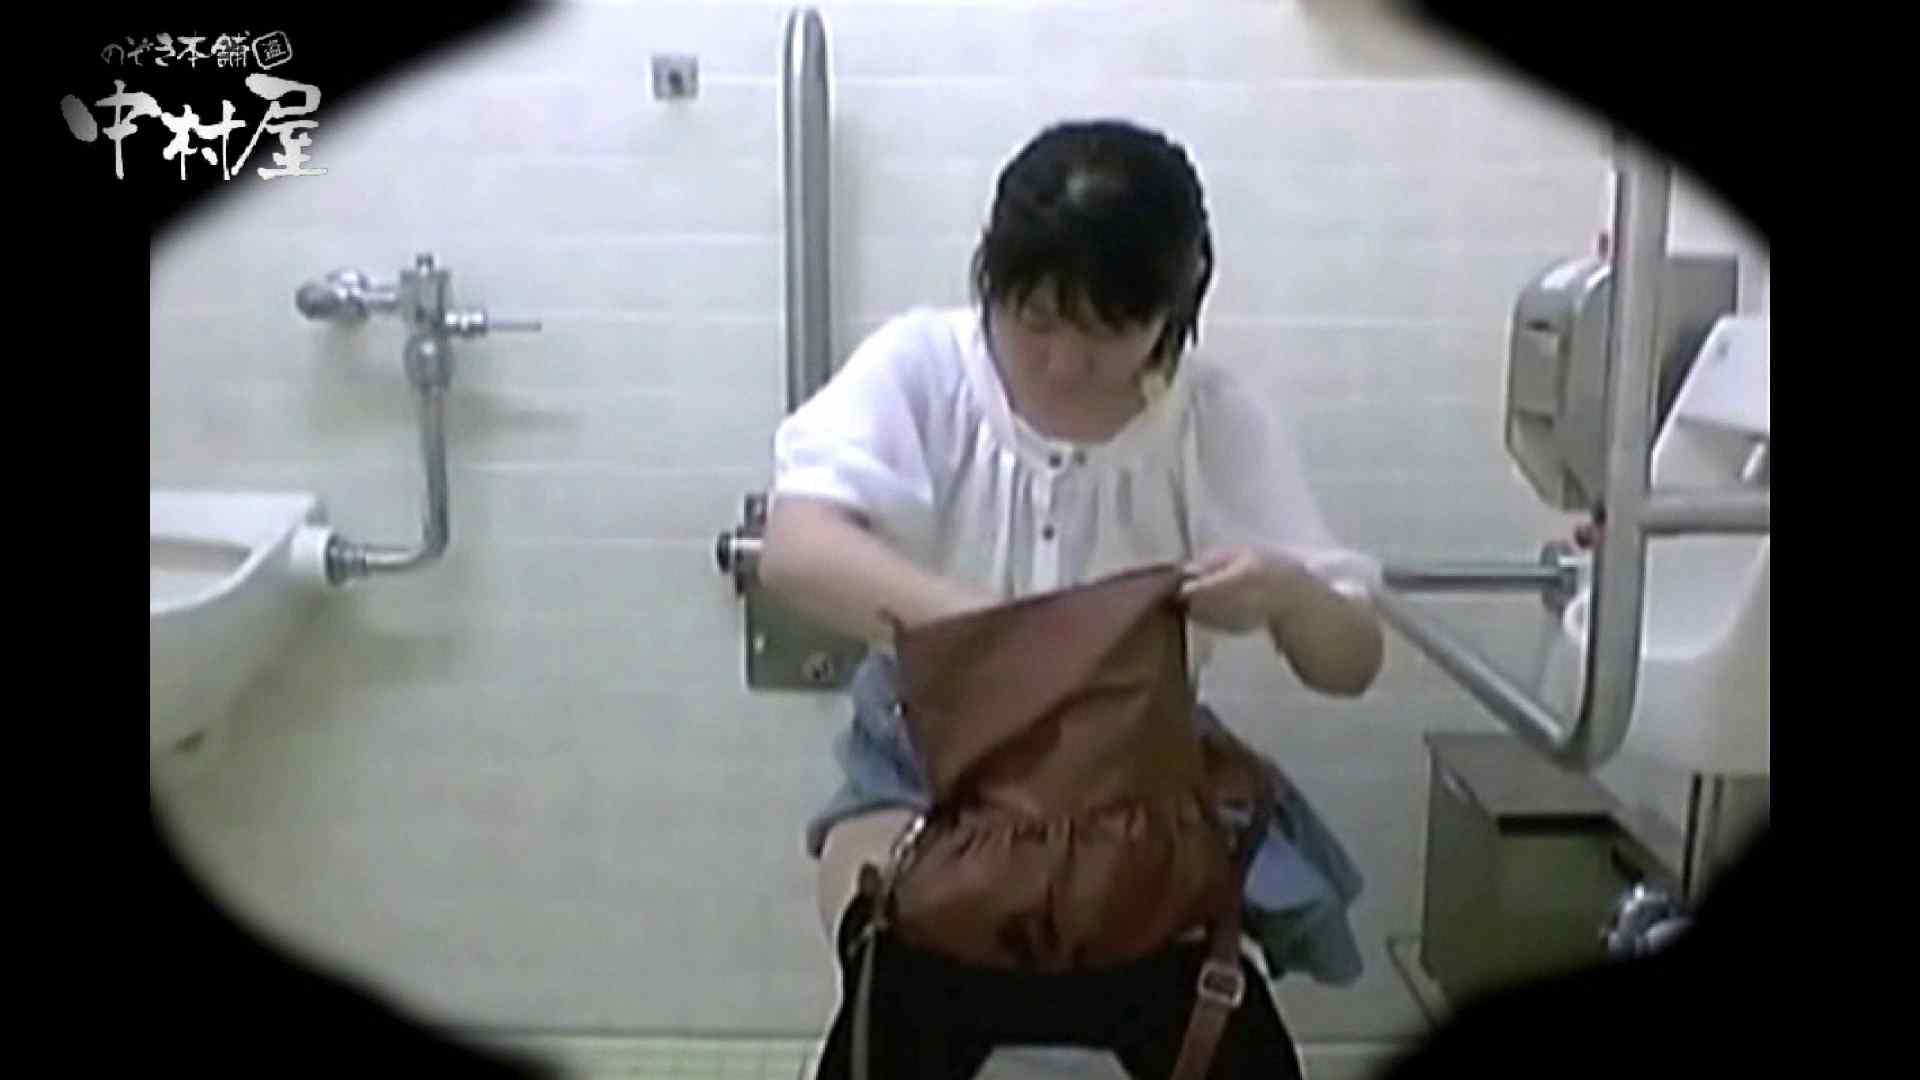 teen galトイレ覗き紙がナイ編‼vol.10 0  88pic 14